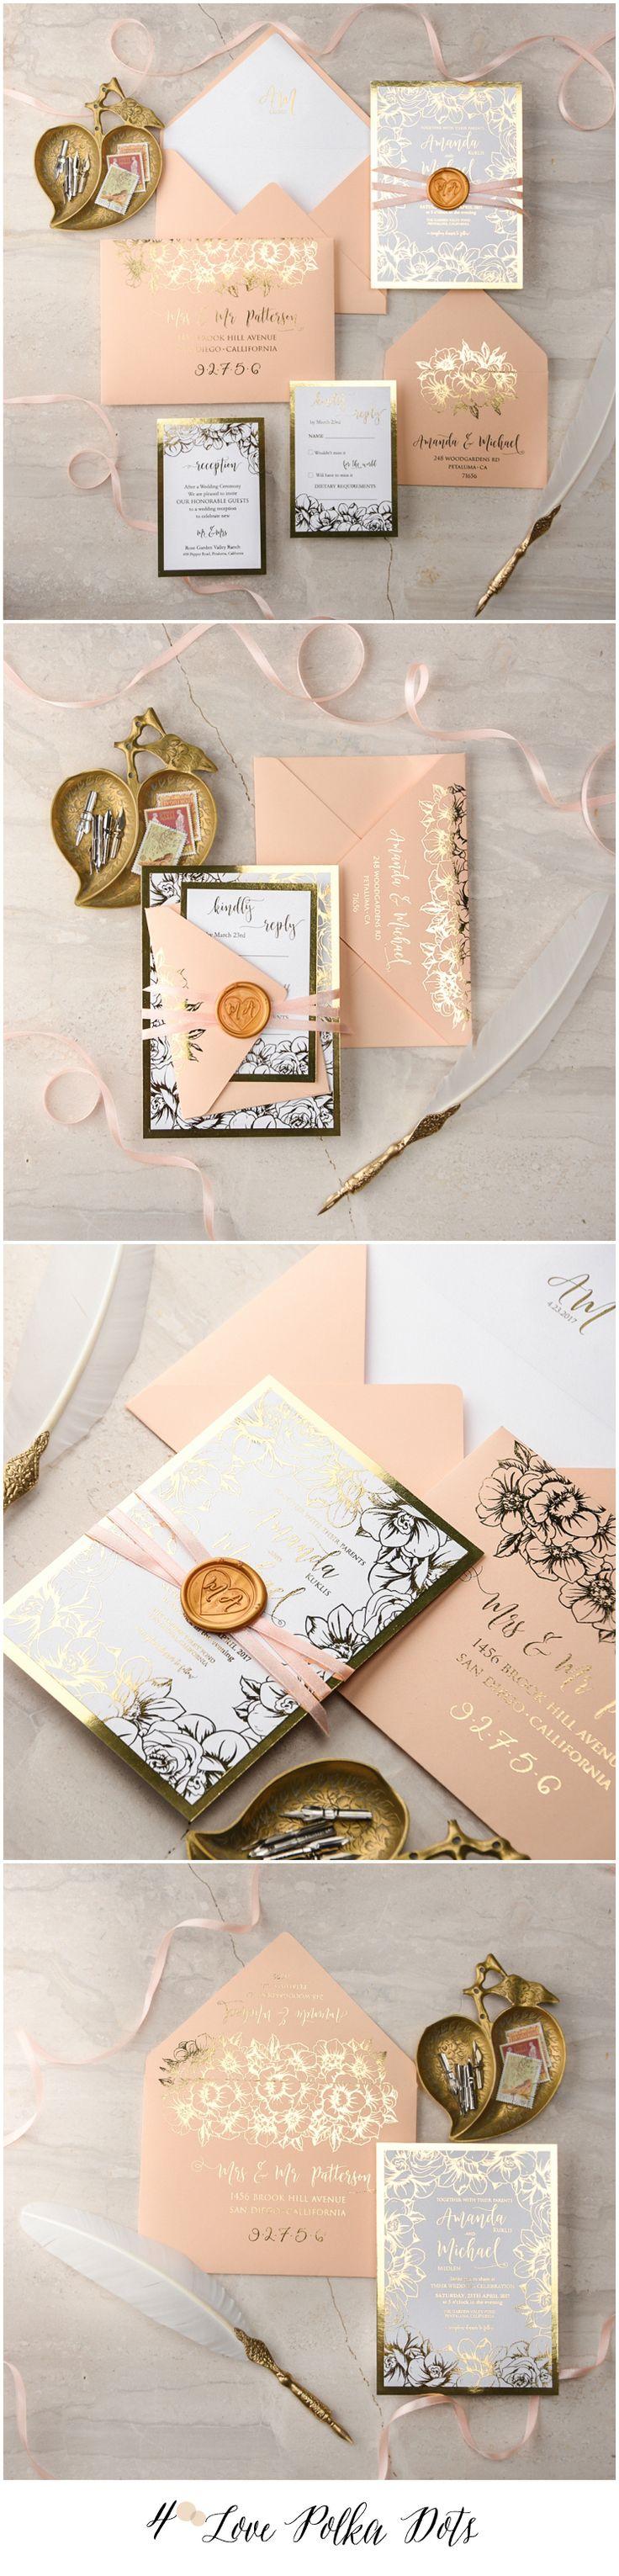 Peach & Gold glamorous Wedding Invitations #shiny #gold #peach #weddingideas #weddinginvitations #blush #romantic #elegant #goldfoil